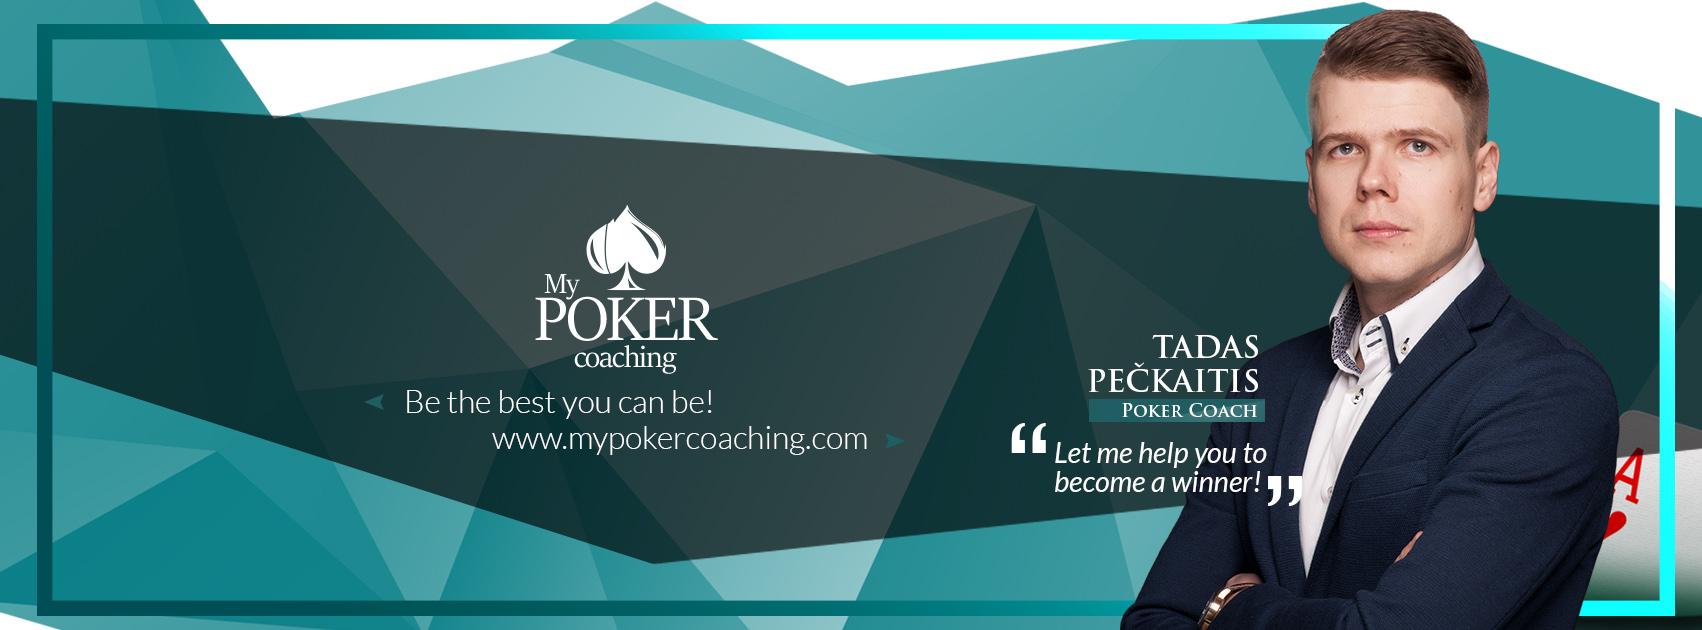 MyPokerCoaching - Poker coaching websites